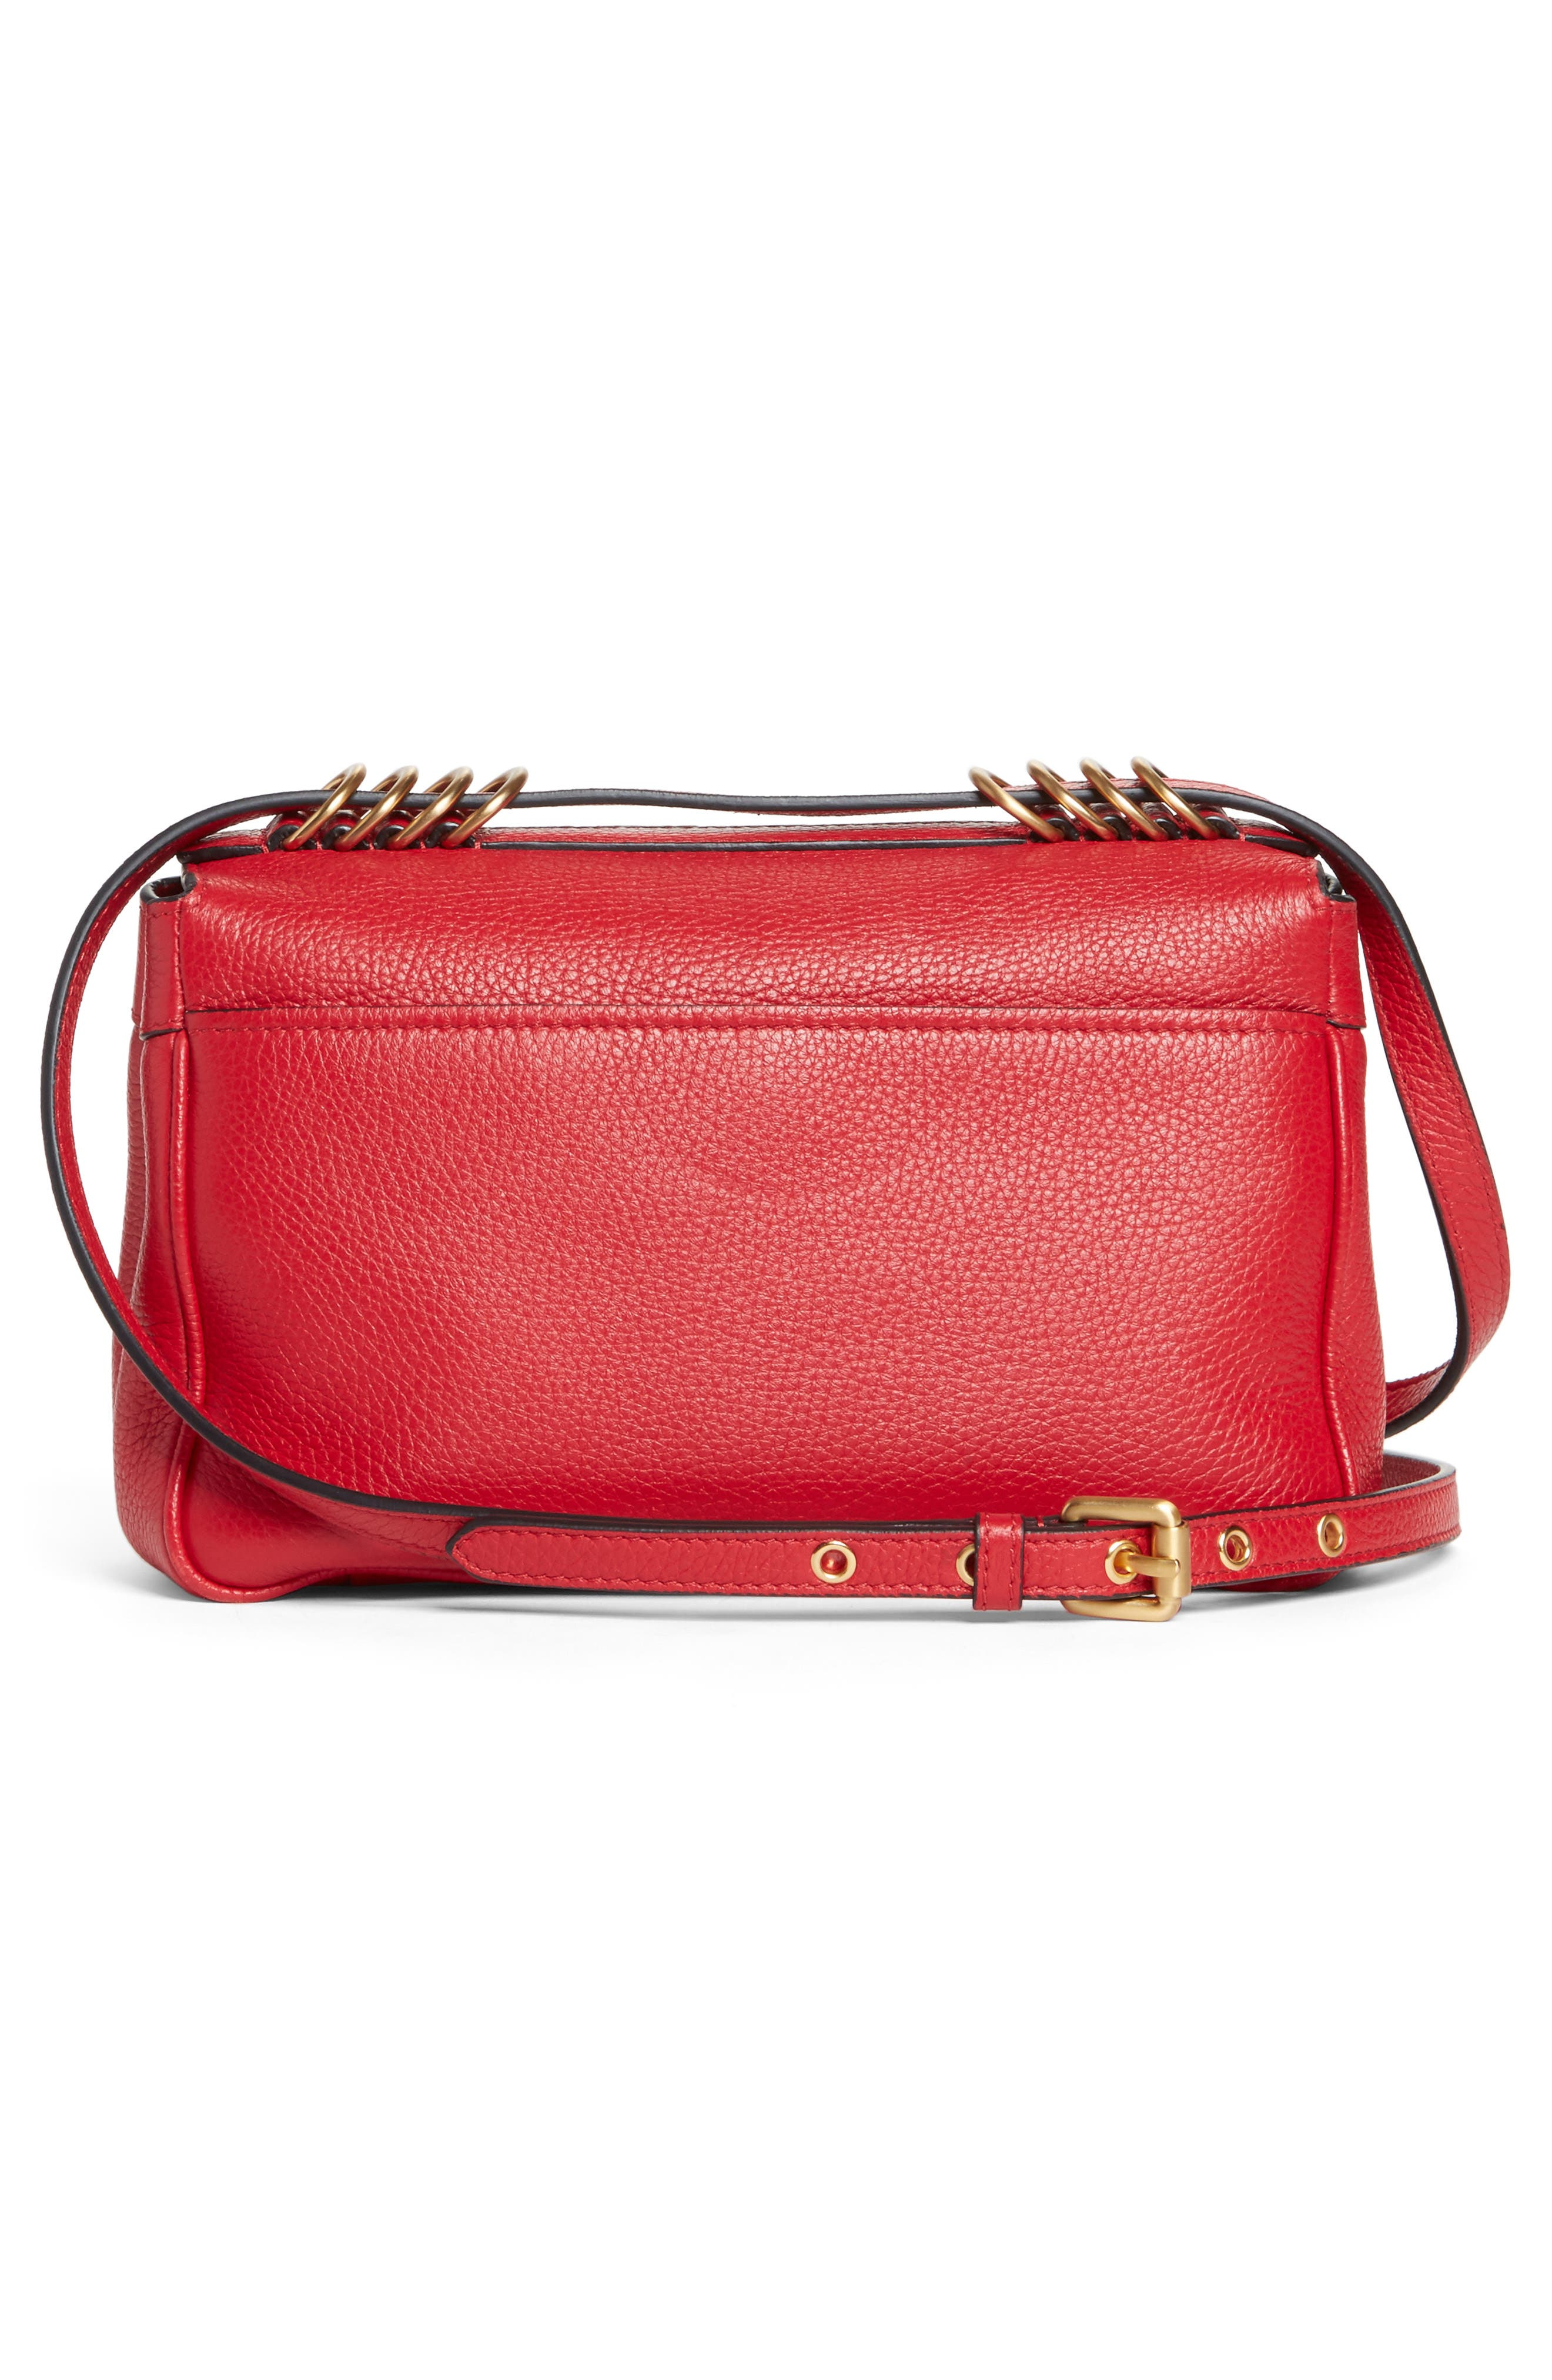 Grainy-B Leather Crossbody Bag,                             Alternate thumbnail 3, color,                             Red